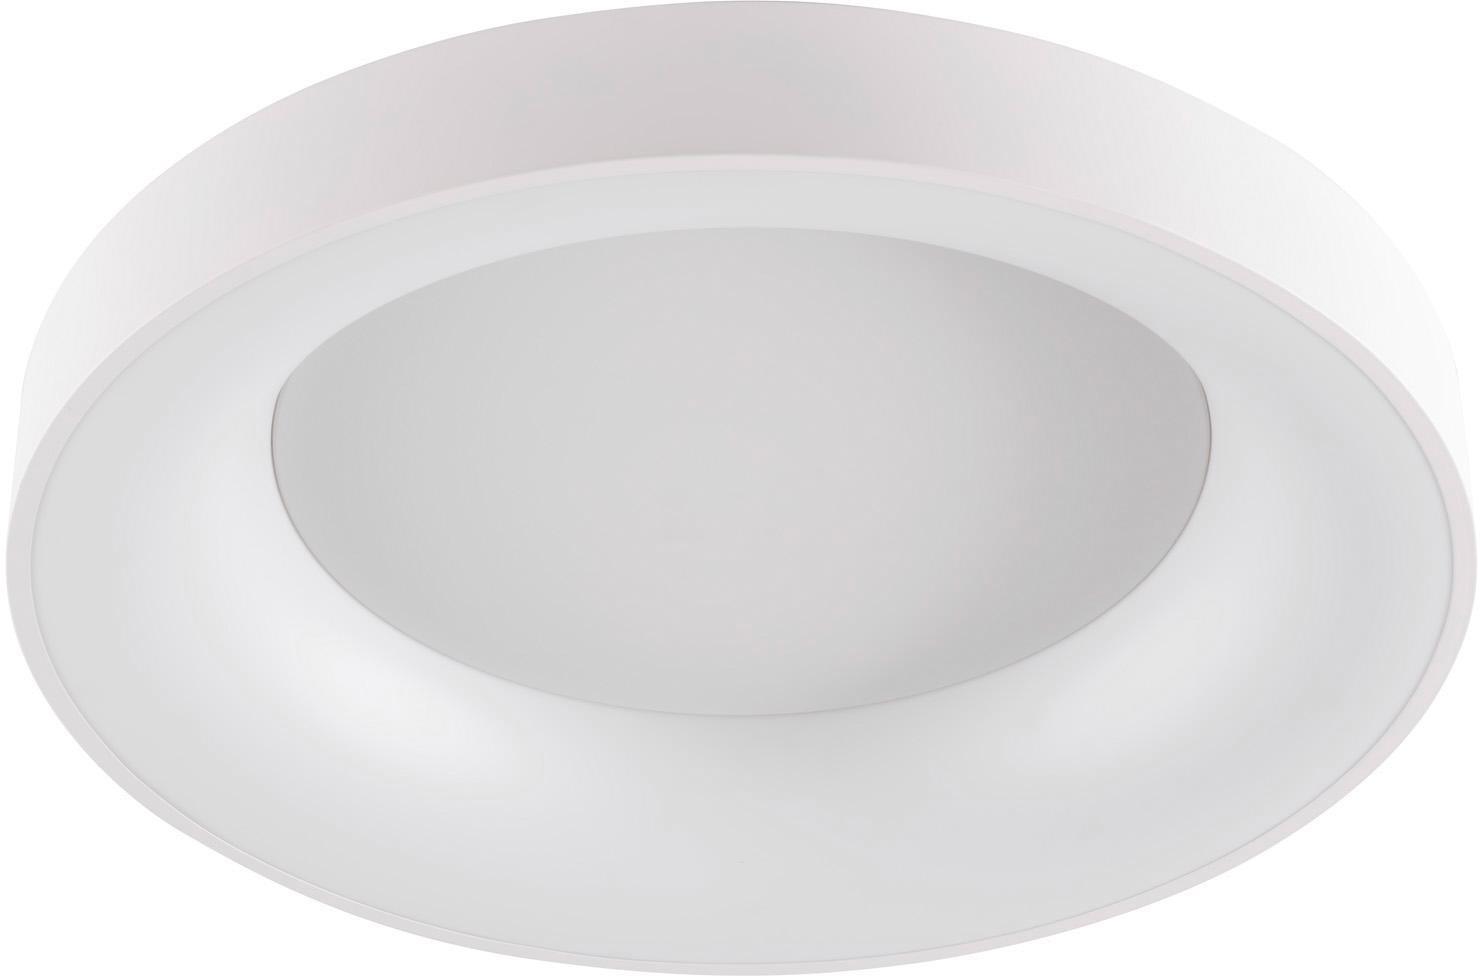 WOFI LED Deckenleuchte CAMERON, LED-Board, Warmweiß-Neutralweiß-Kaltweiß-Tageslichtweiß, LED Deckenlampe